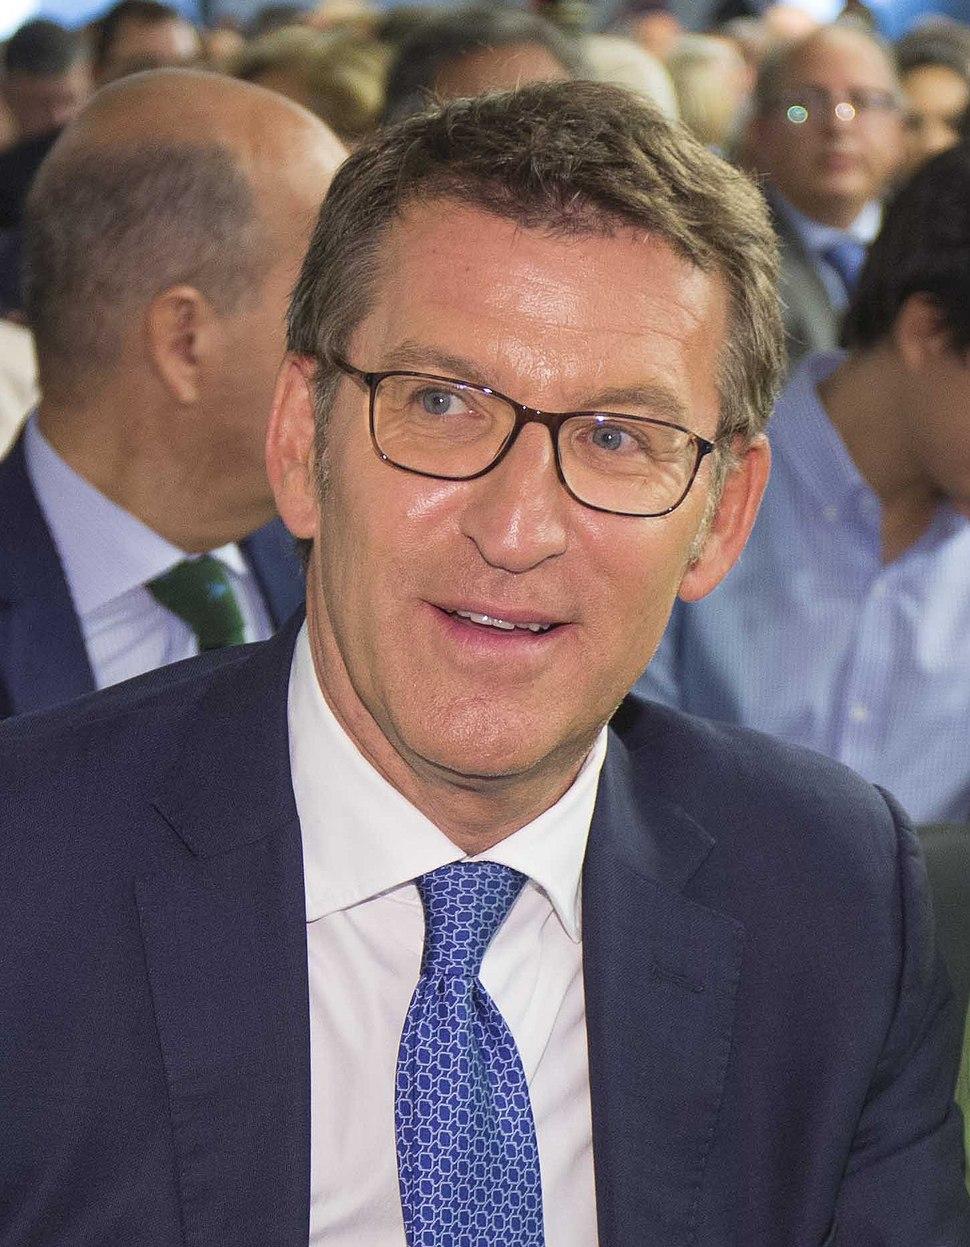 (Alberto Núñez Feijóo) Junta Directiva Nacional del PP, 4 de septiembre de 2017 Cifuentes-Feijóo (cropped)